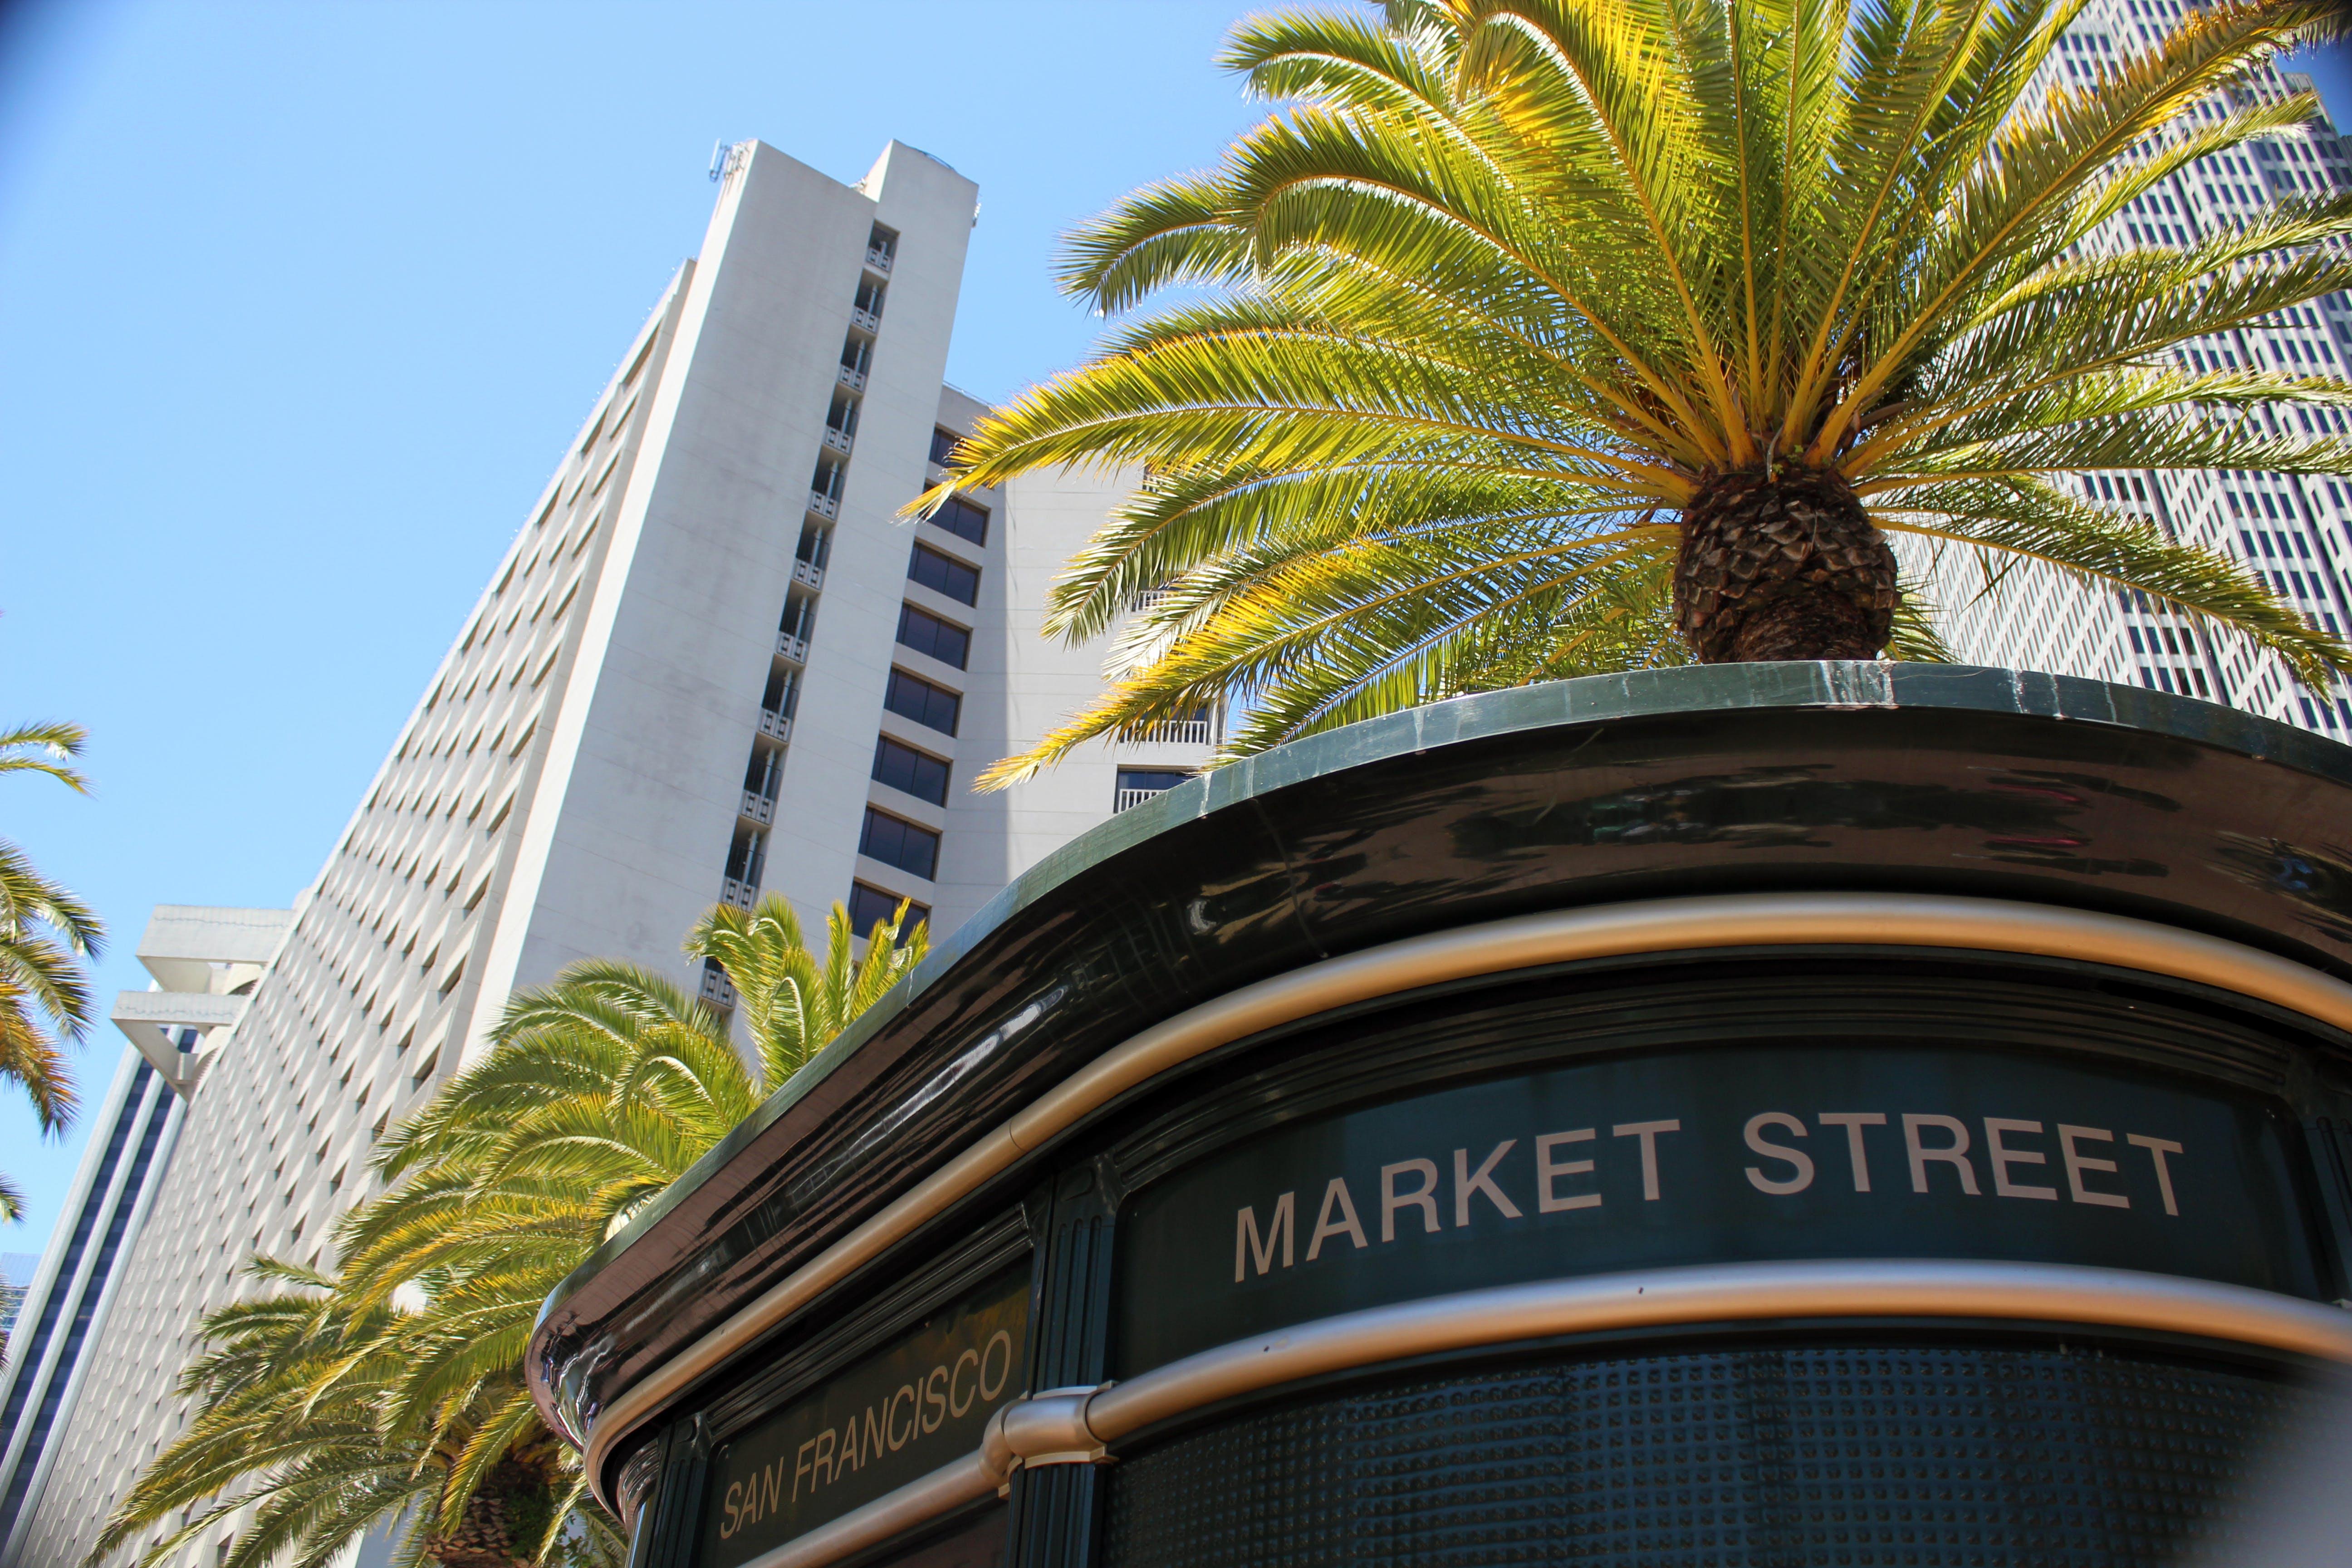 Free stock photo of market street